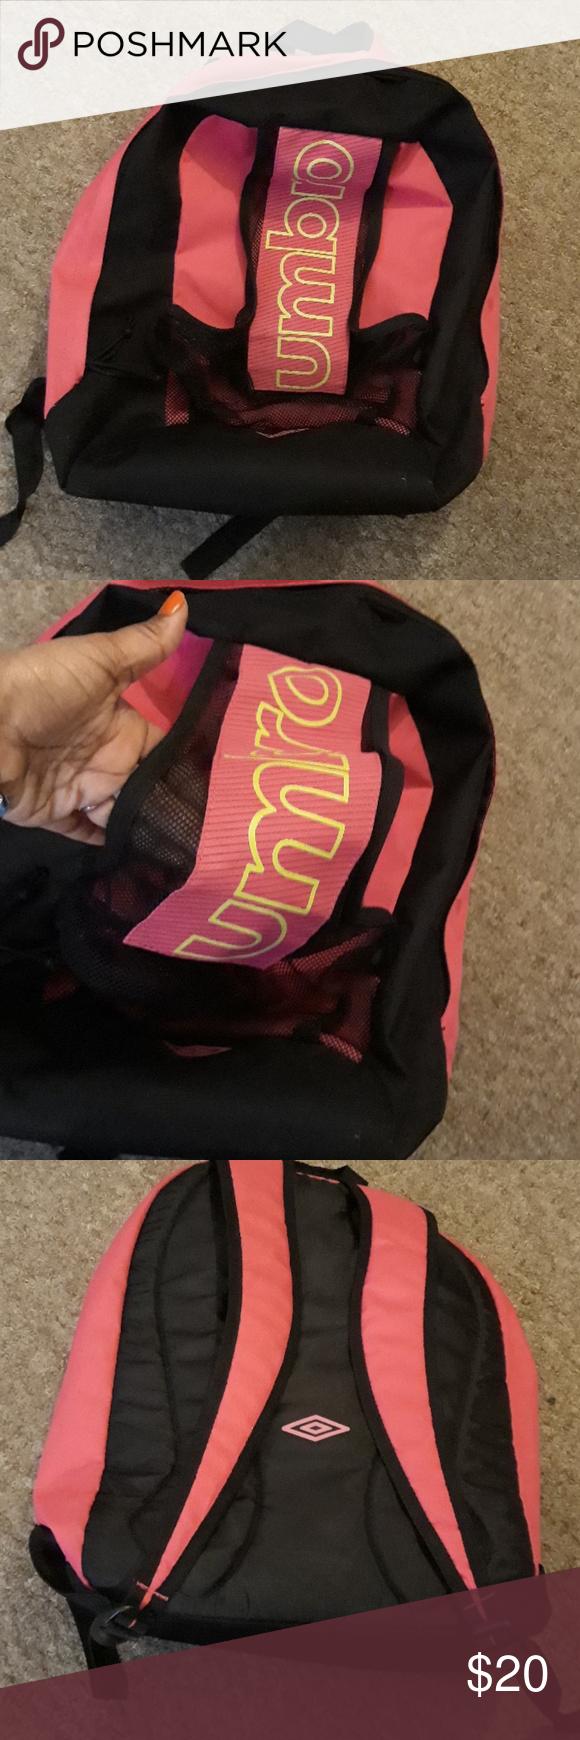 Umbro soccer bag Umbro soccer bag name written in marker as seen in pic  Umbro Accessories c66997e443